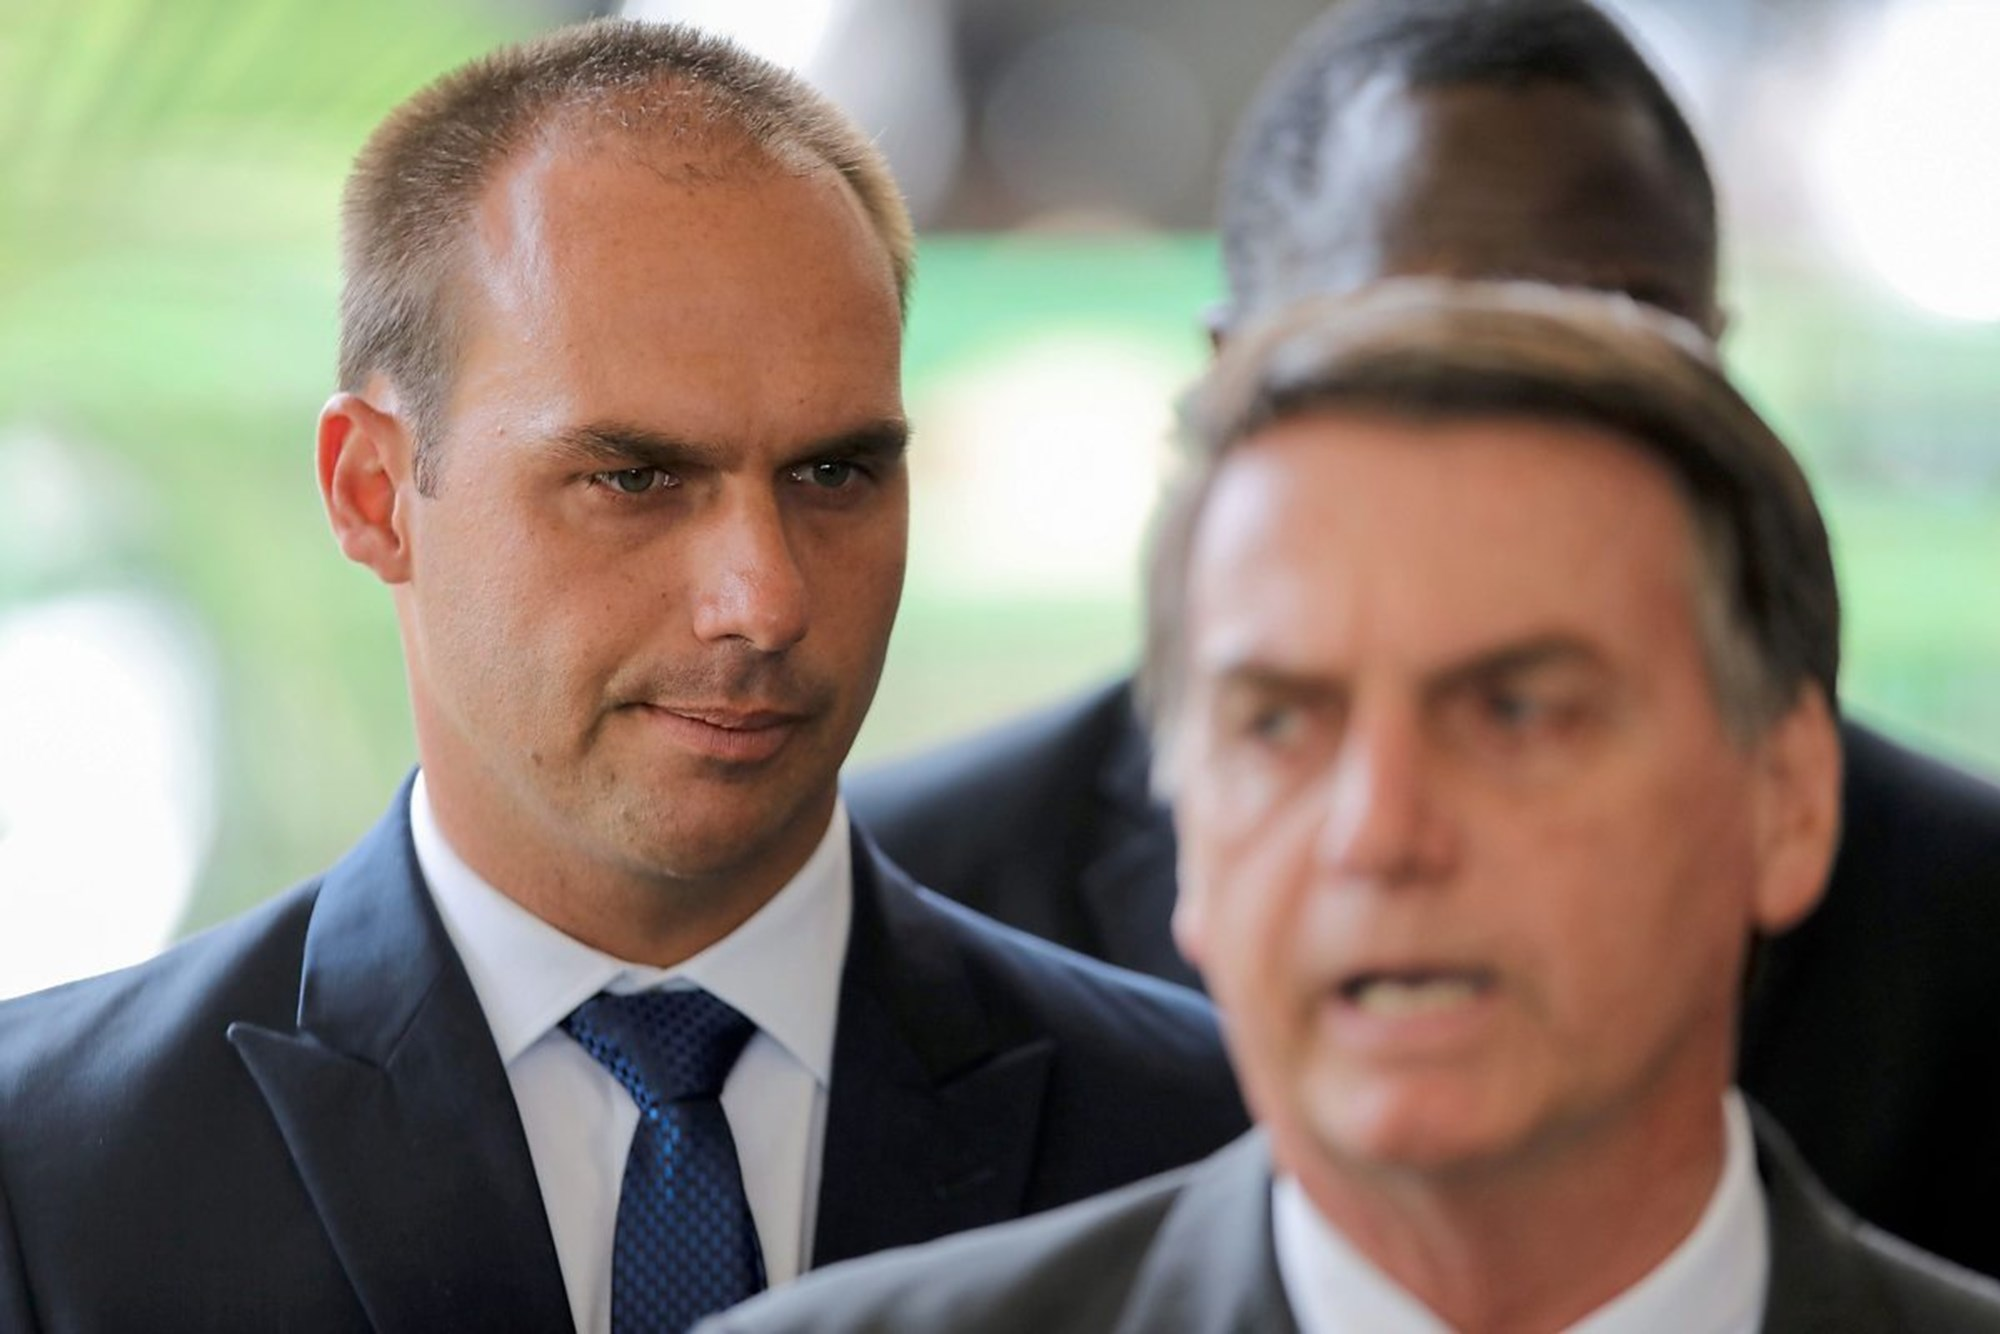 Sohn von Bolsonaro schließt sich Bannons ultrarechter Bewegung an